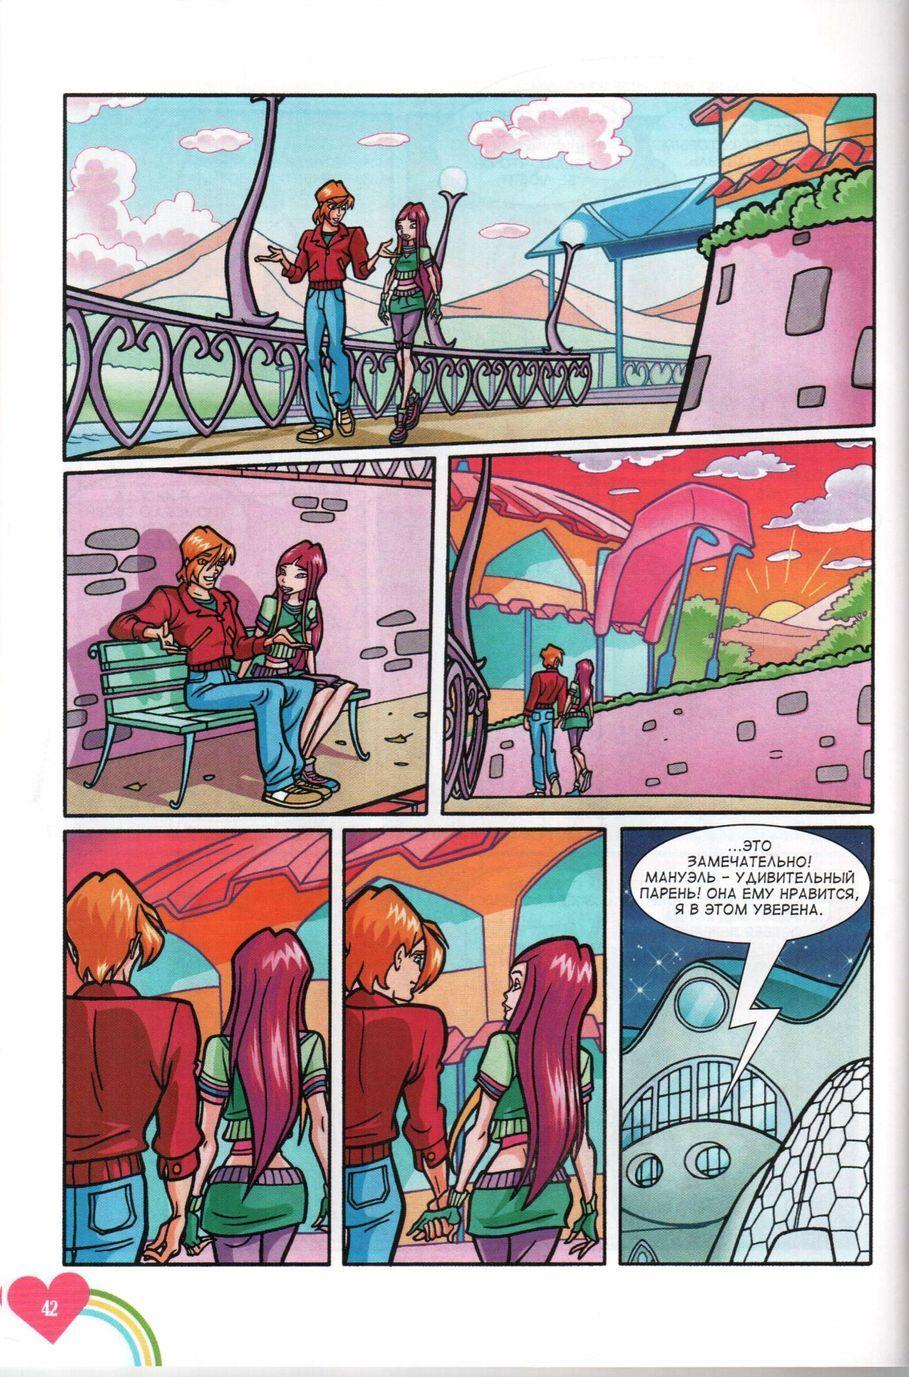 Комикс Винкс Winx - Опасный замысел (Журнал Винкс №10 2011) - стр. 42